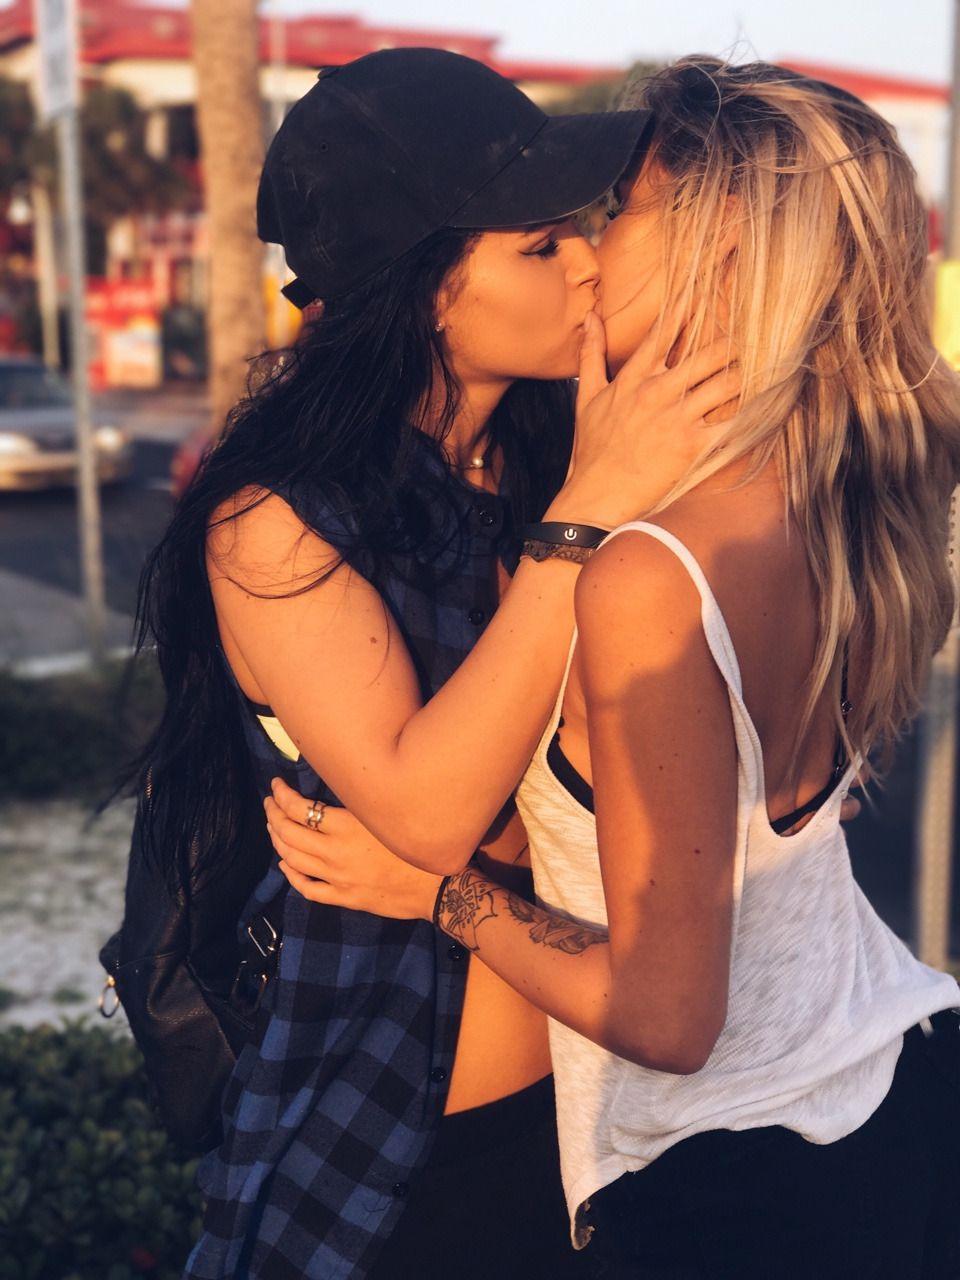 Eroticia lesbea sexo licking